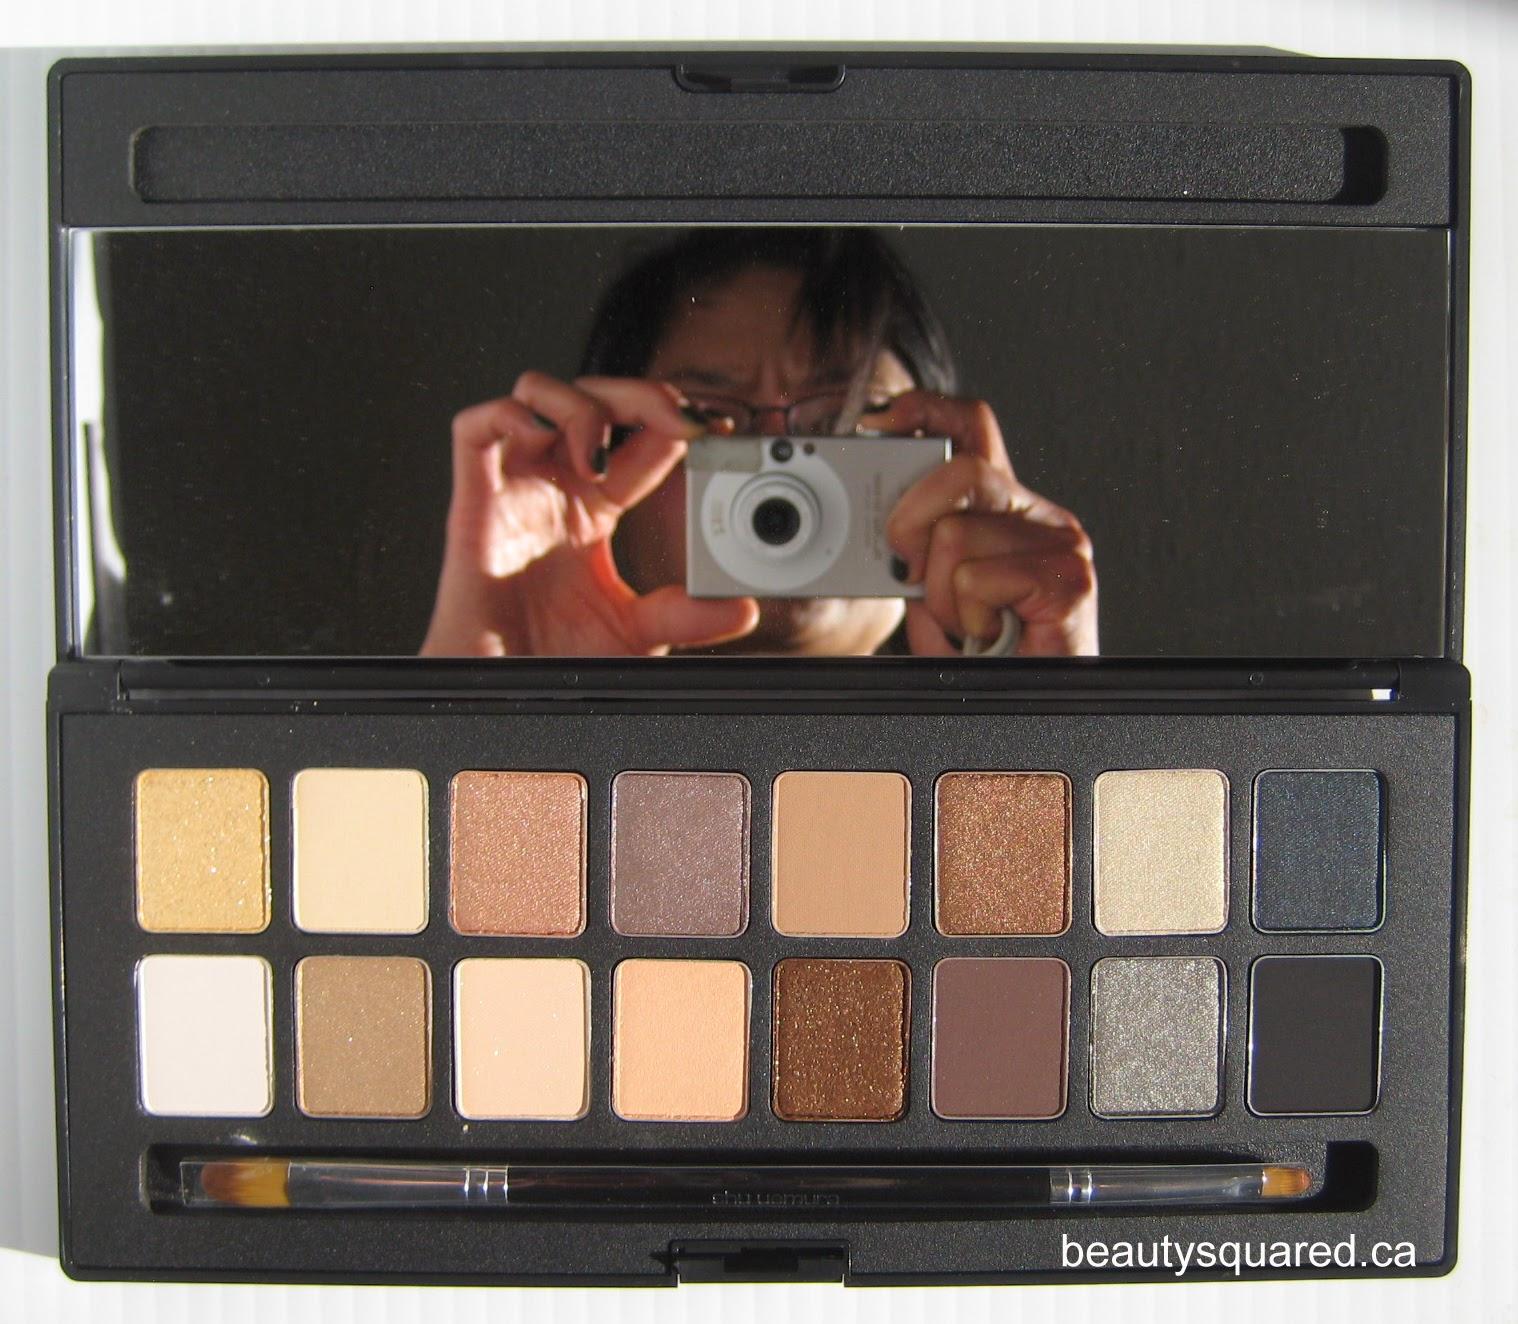 MAKEUP LOOK | Shu Uemura shu:palette 16 Shades of Nude